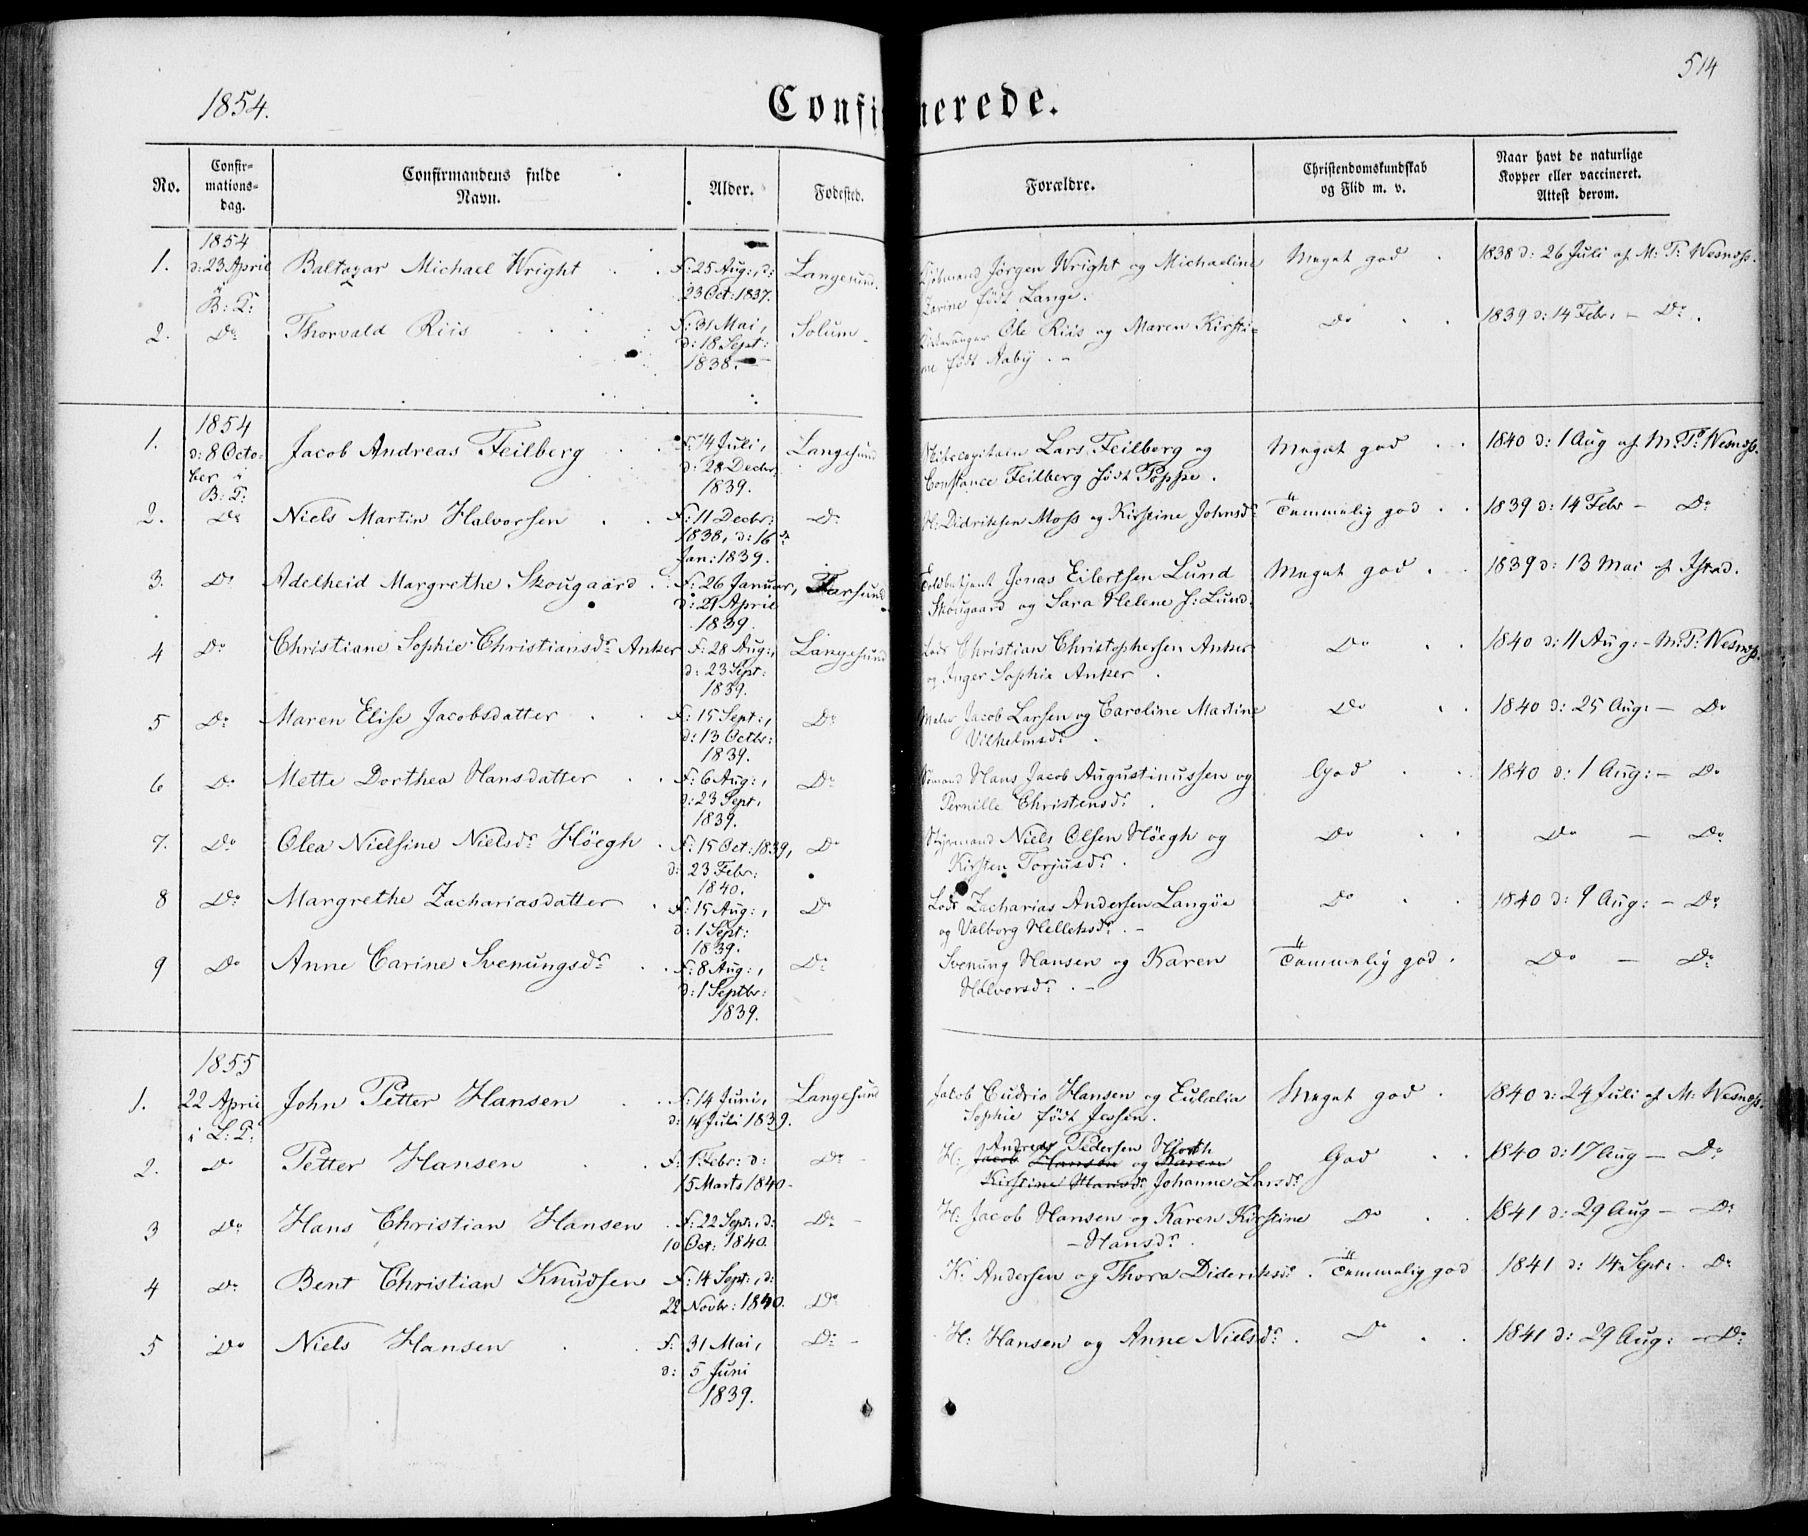 SAKO, Bamble kirkebøker, F/Fa/L0005: Ministerialbok nr. I 5, 1854-1869, s. 514